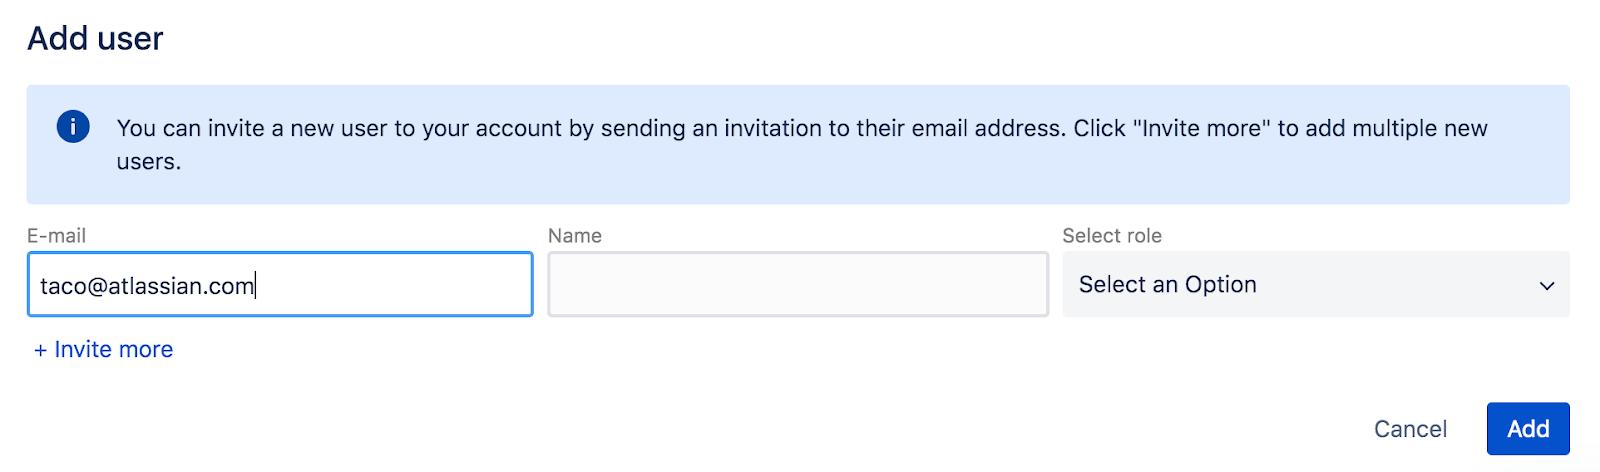 Screenshot highlighting add user field